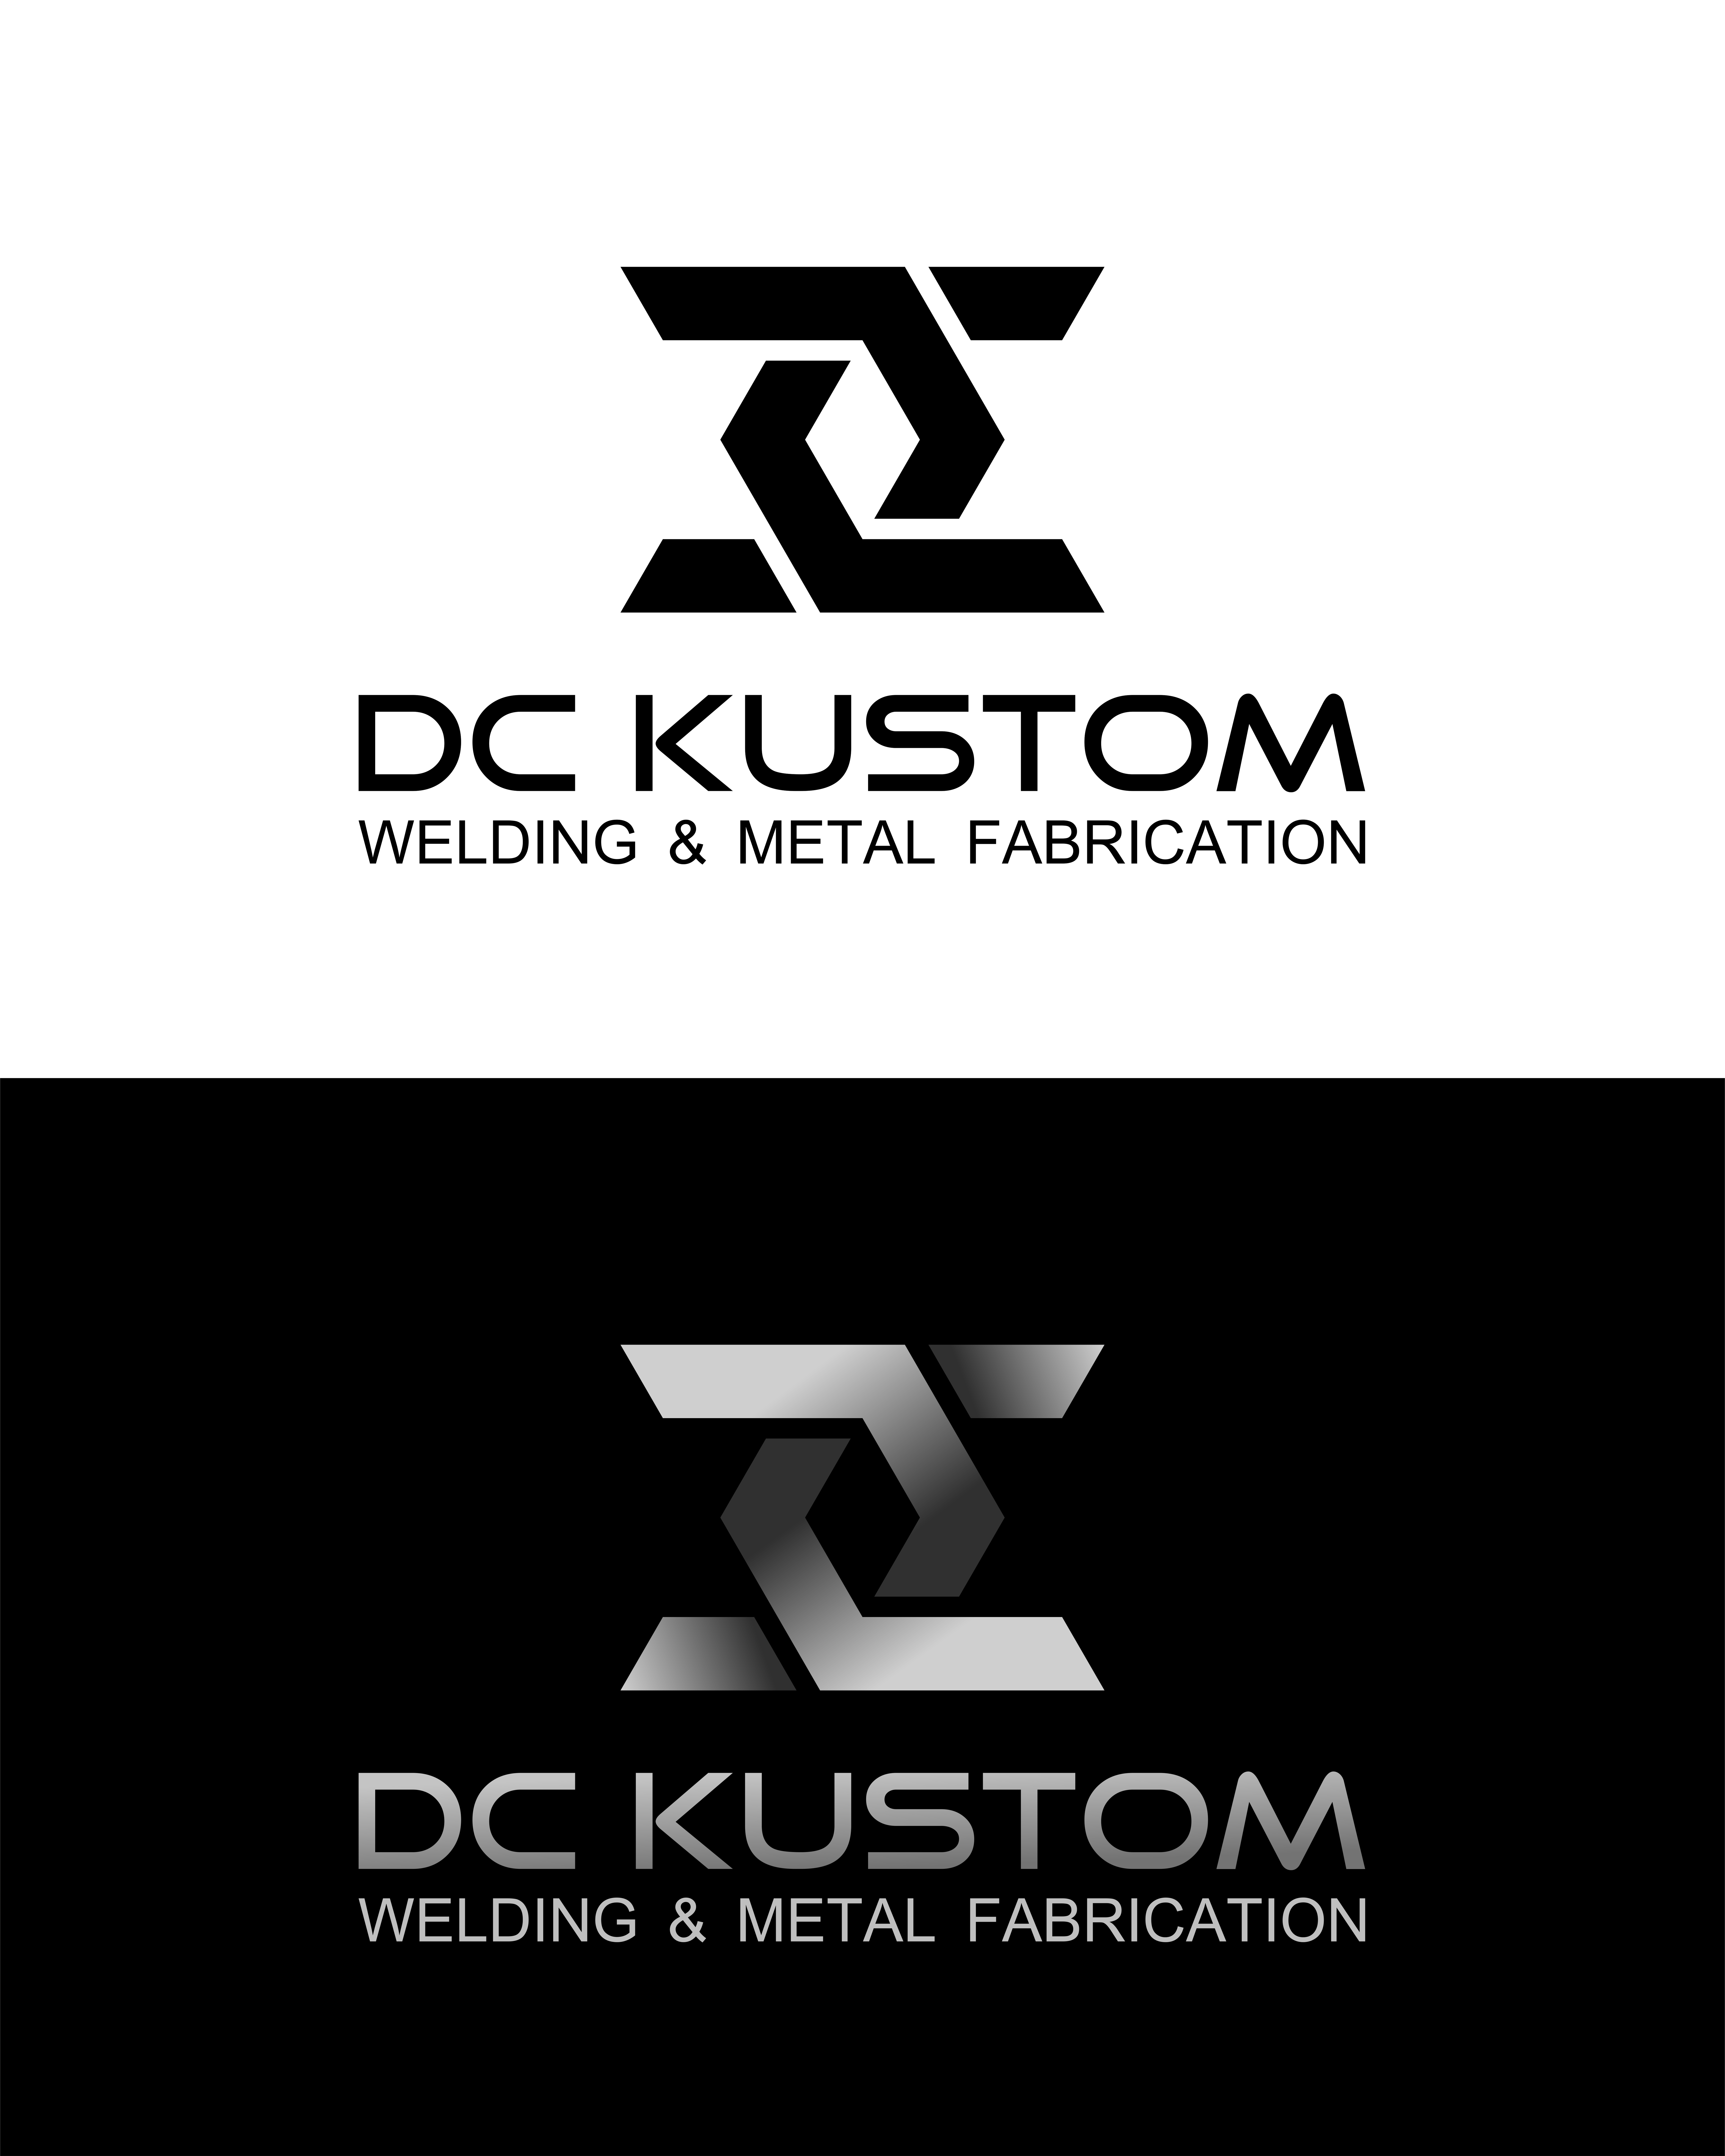 Logo Design by Net Bih - Entry No. 82 in the Logo Design Contest Imaginative Logo Design for DC KUSTOM WELDING & METAL FABRICATION.